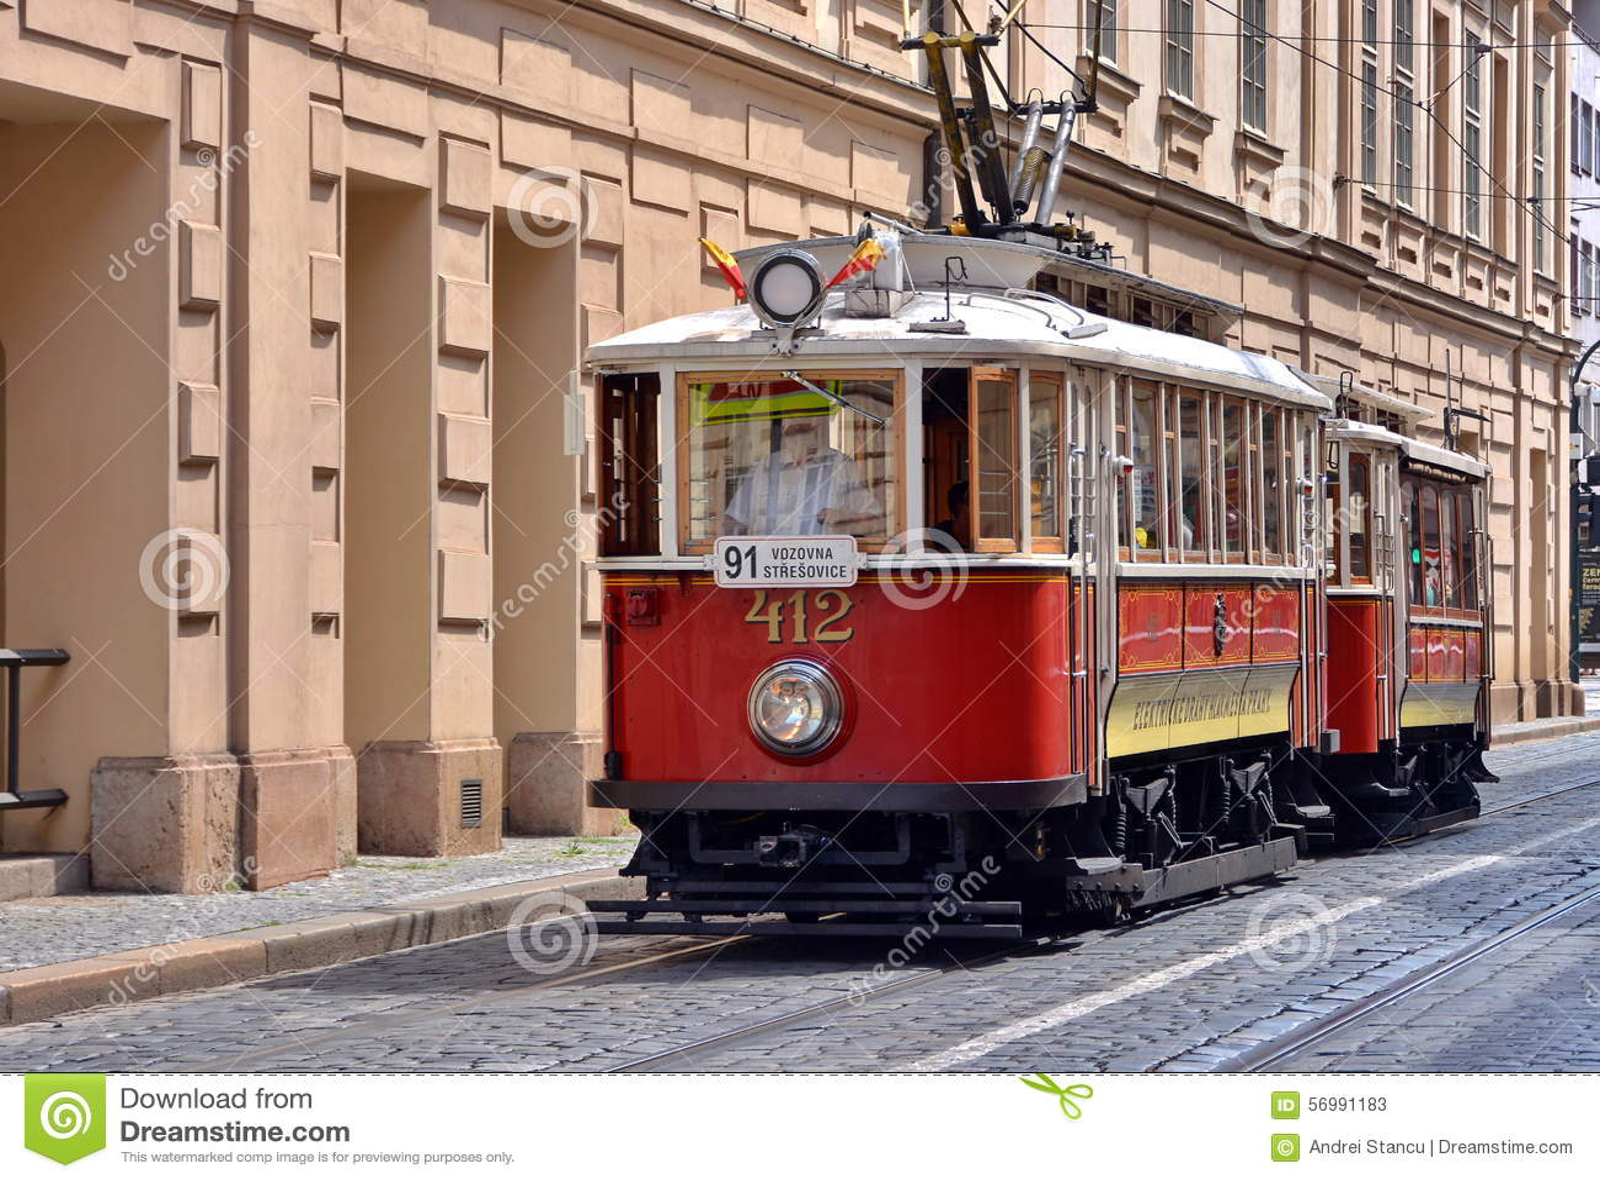 old tram prague street - photo #39